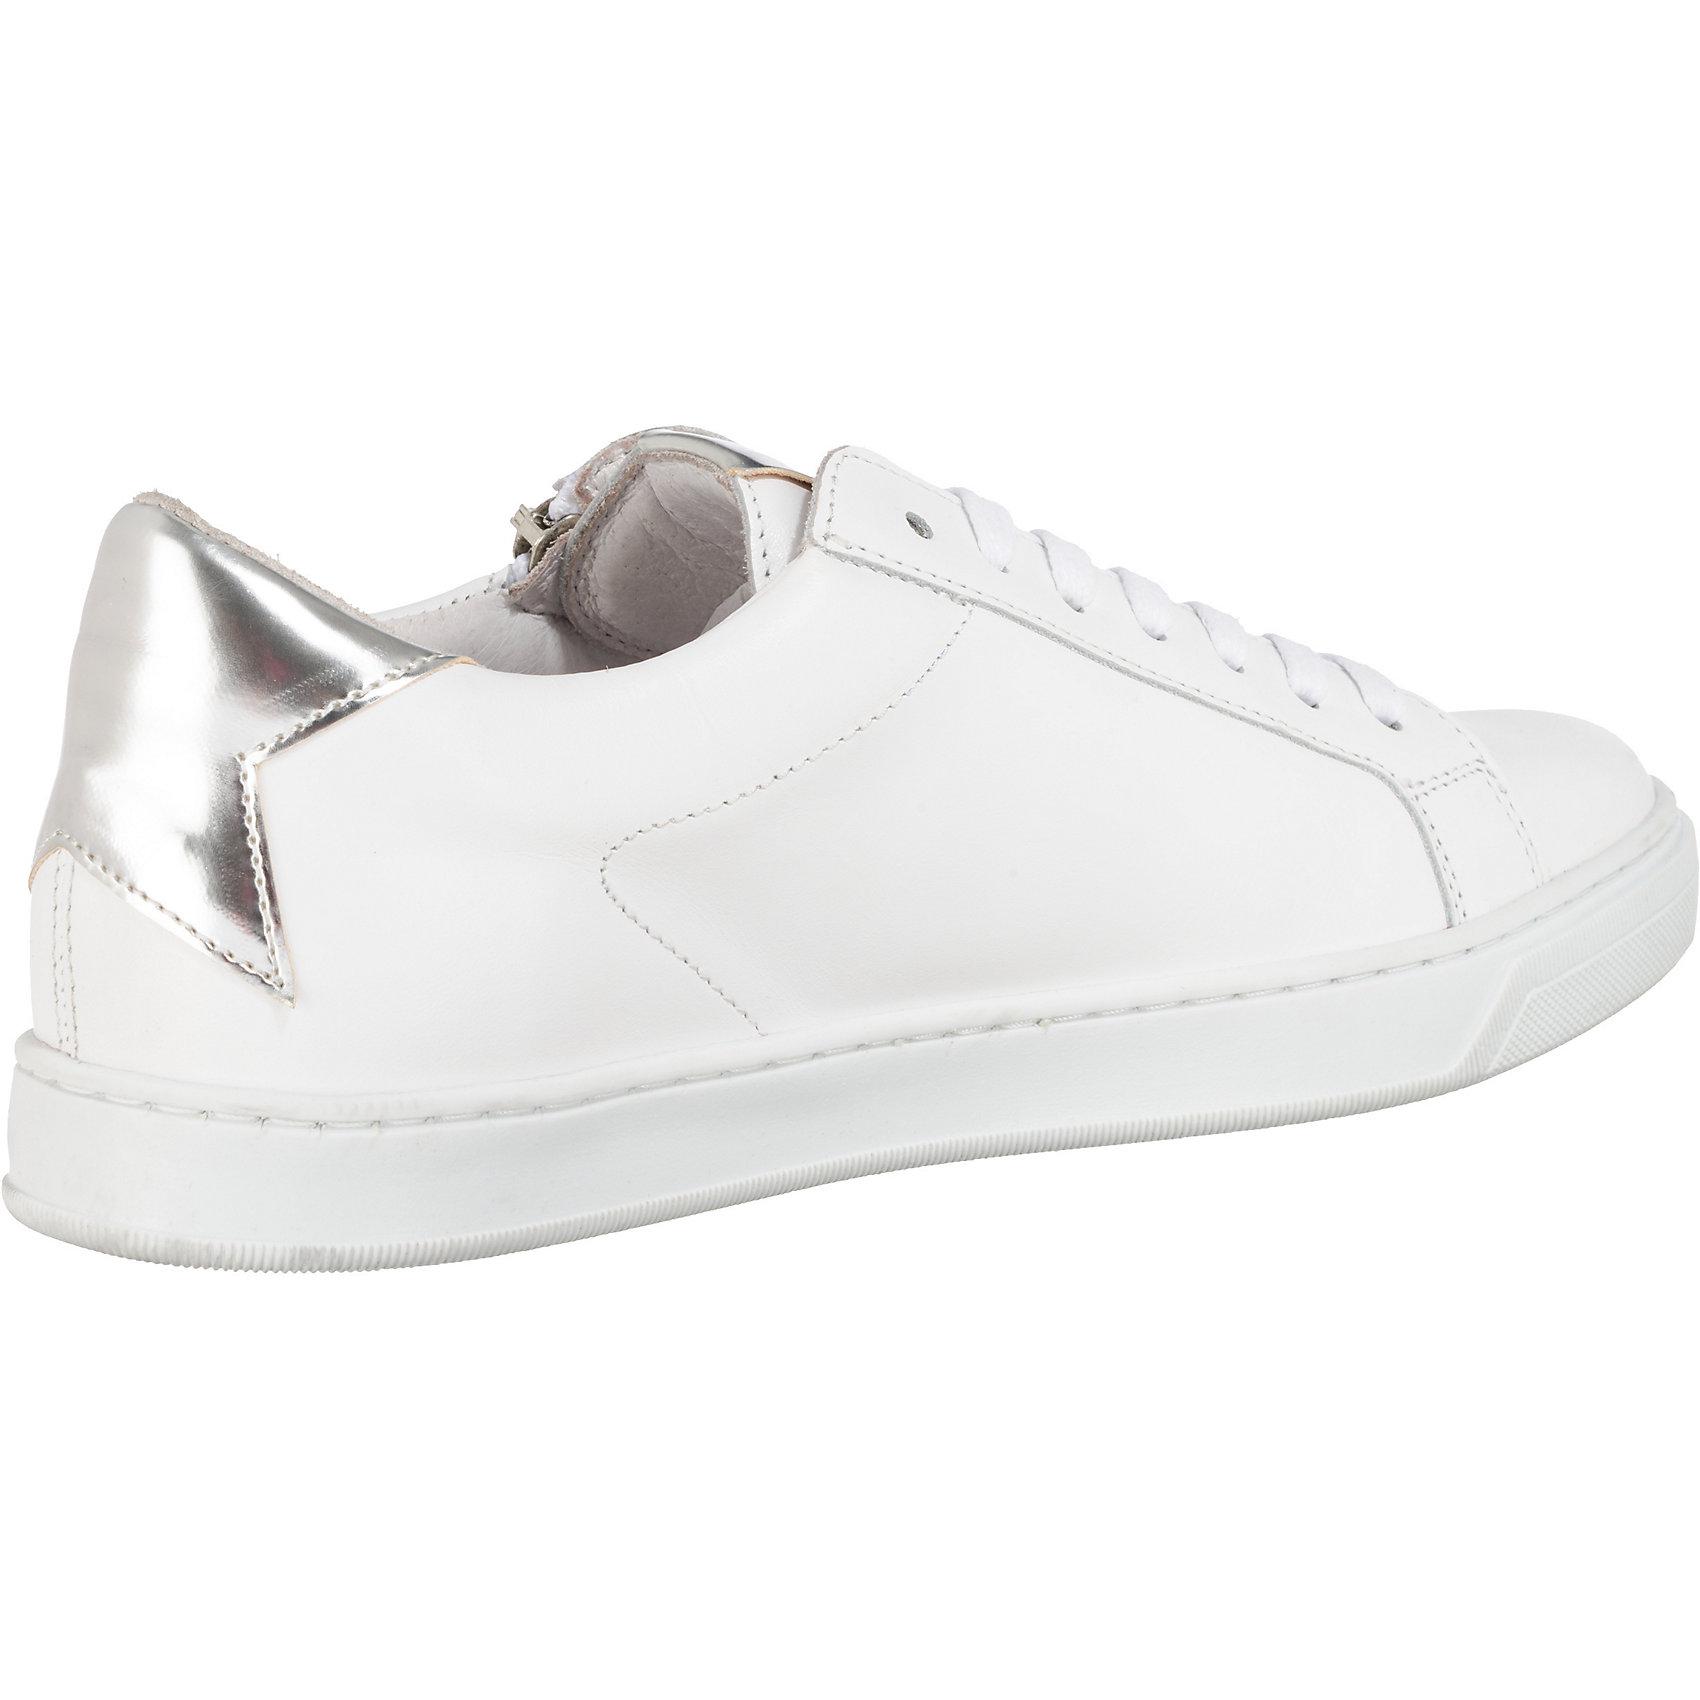 8ba0a51b25c0 ... Neu 7399424 SPM Santander Sneaker Sneakers Niedrig 7399424 Neu für Damen  weiß e18224 ...